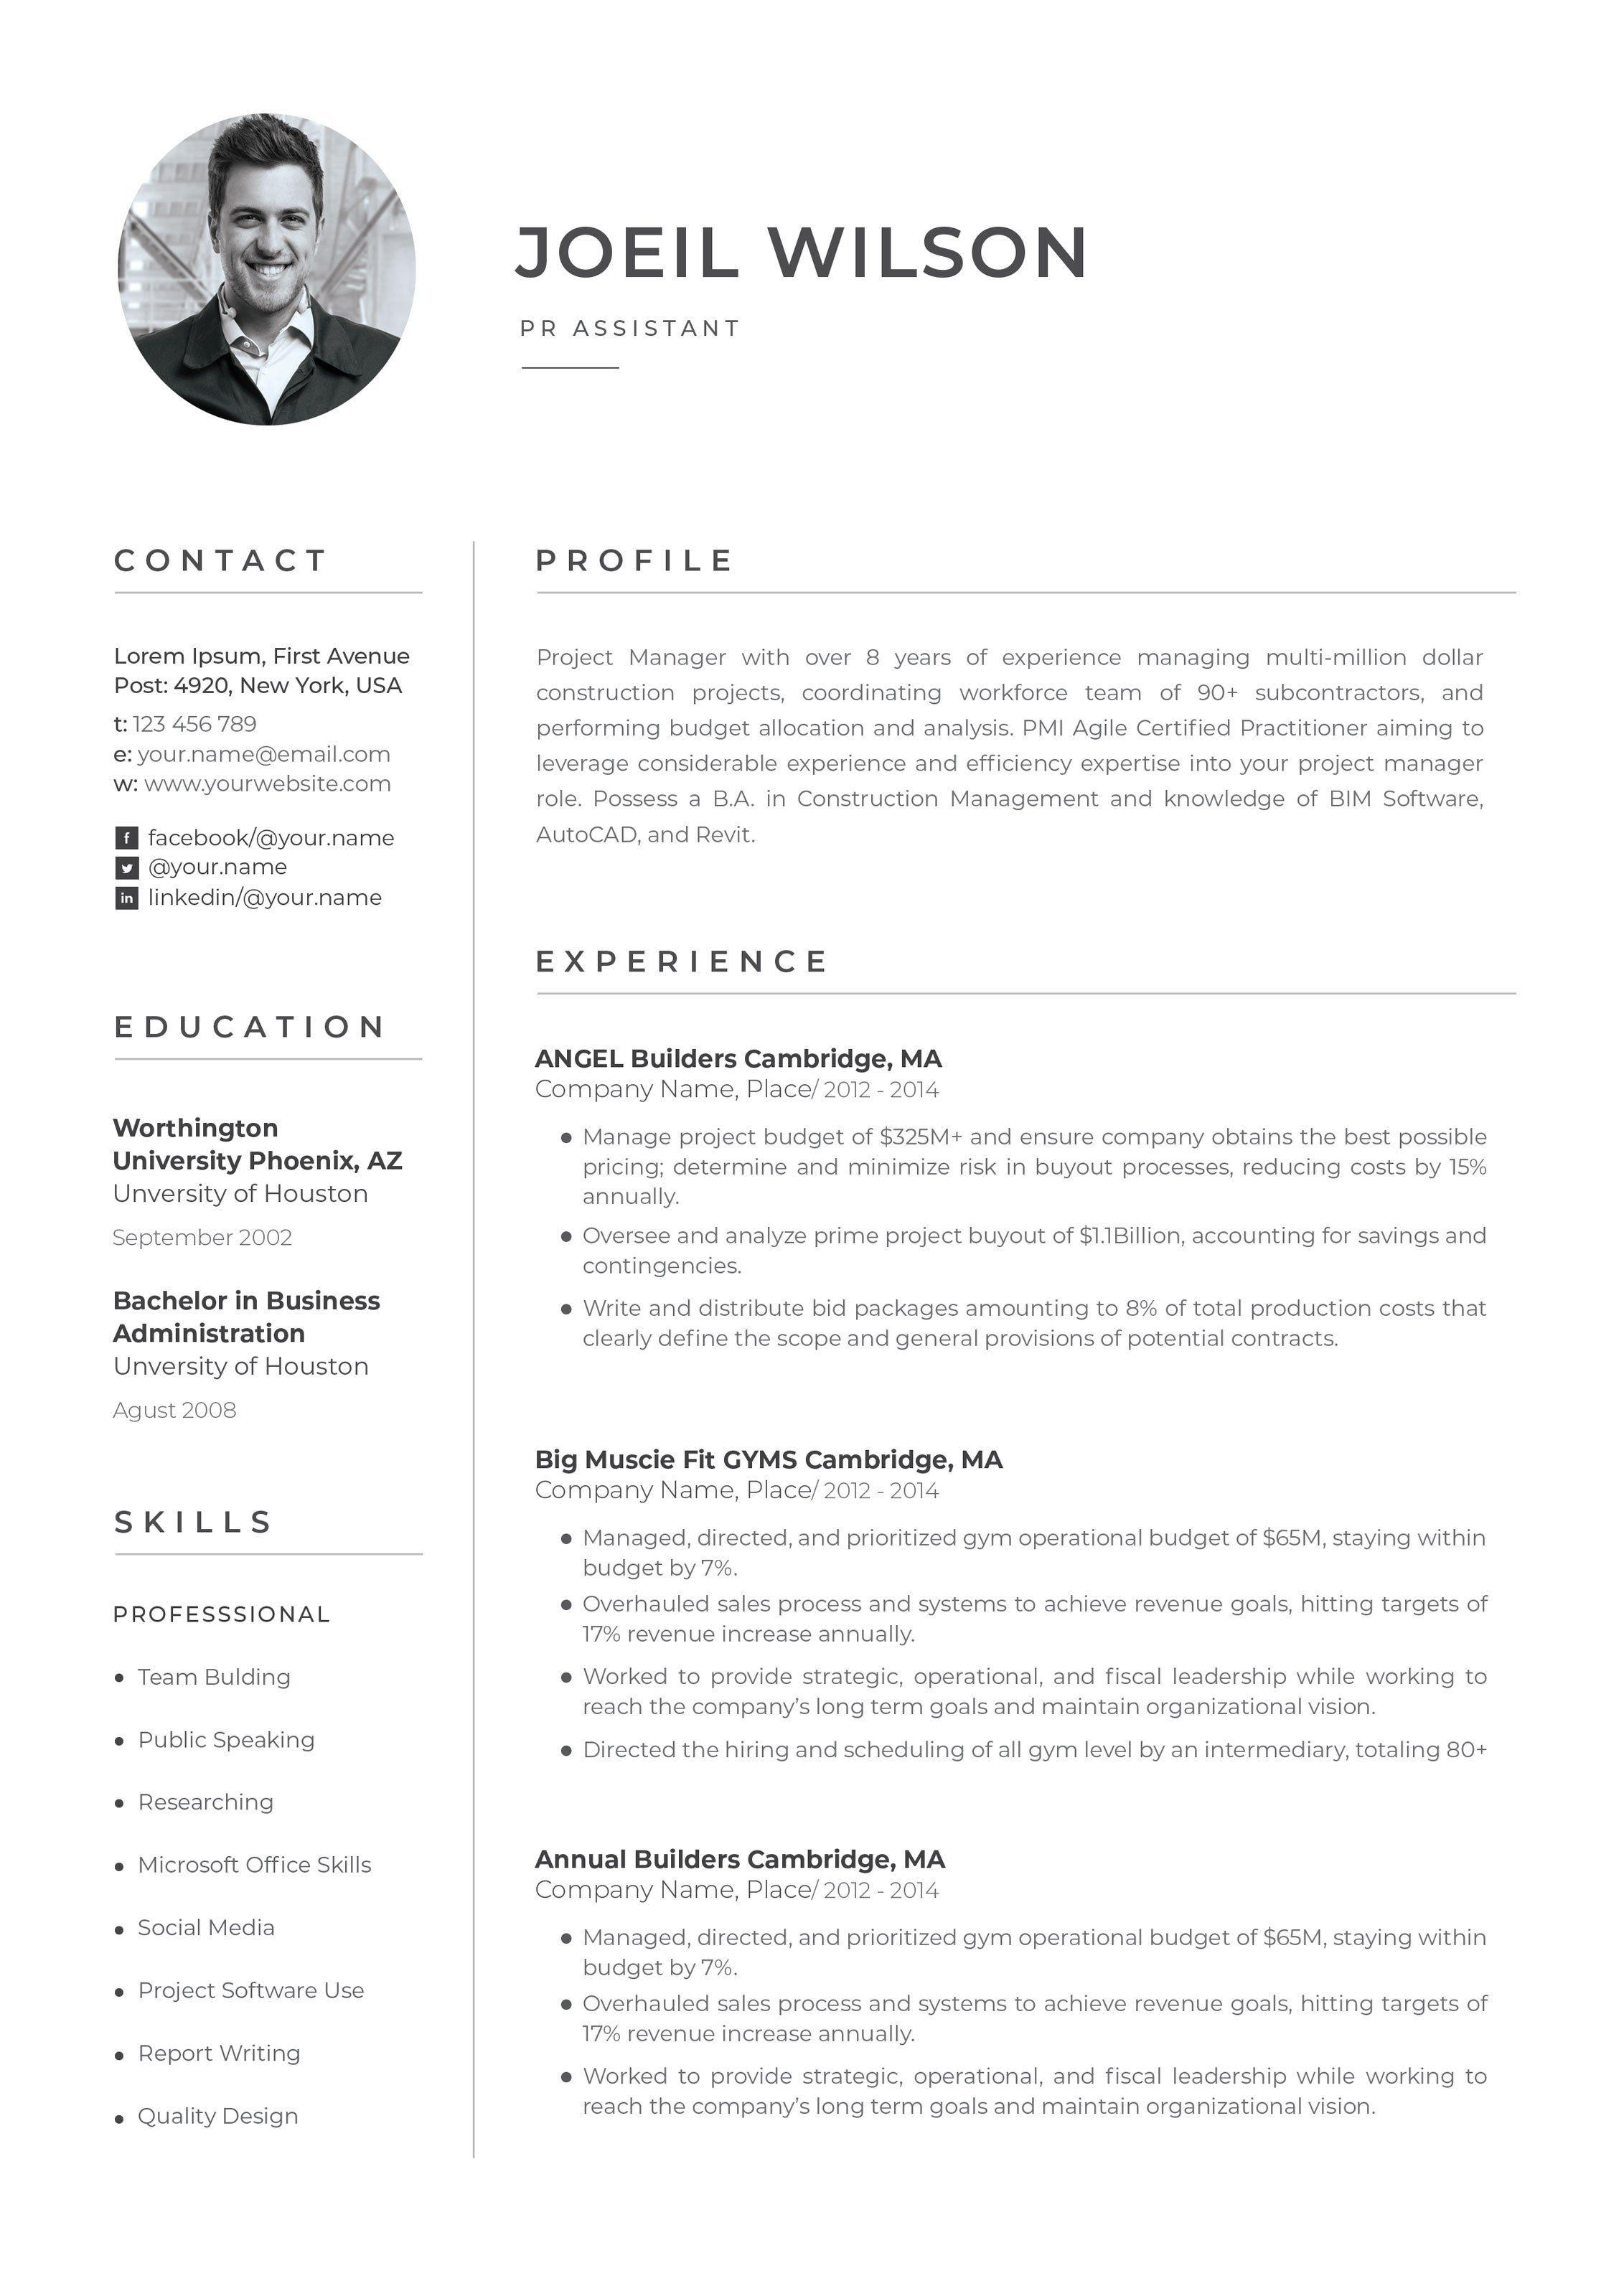 Word Resume Resume cover letter template, Cover letter